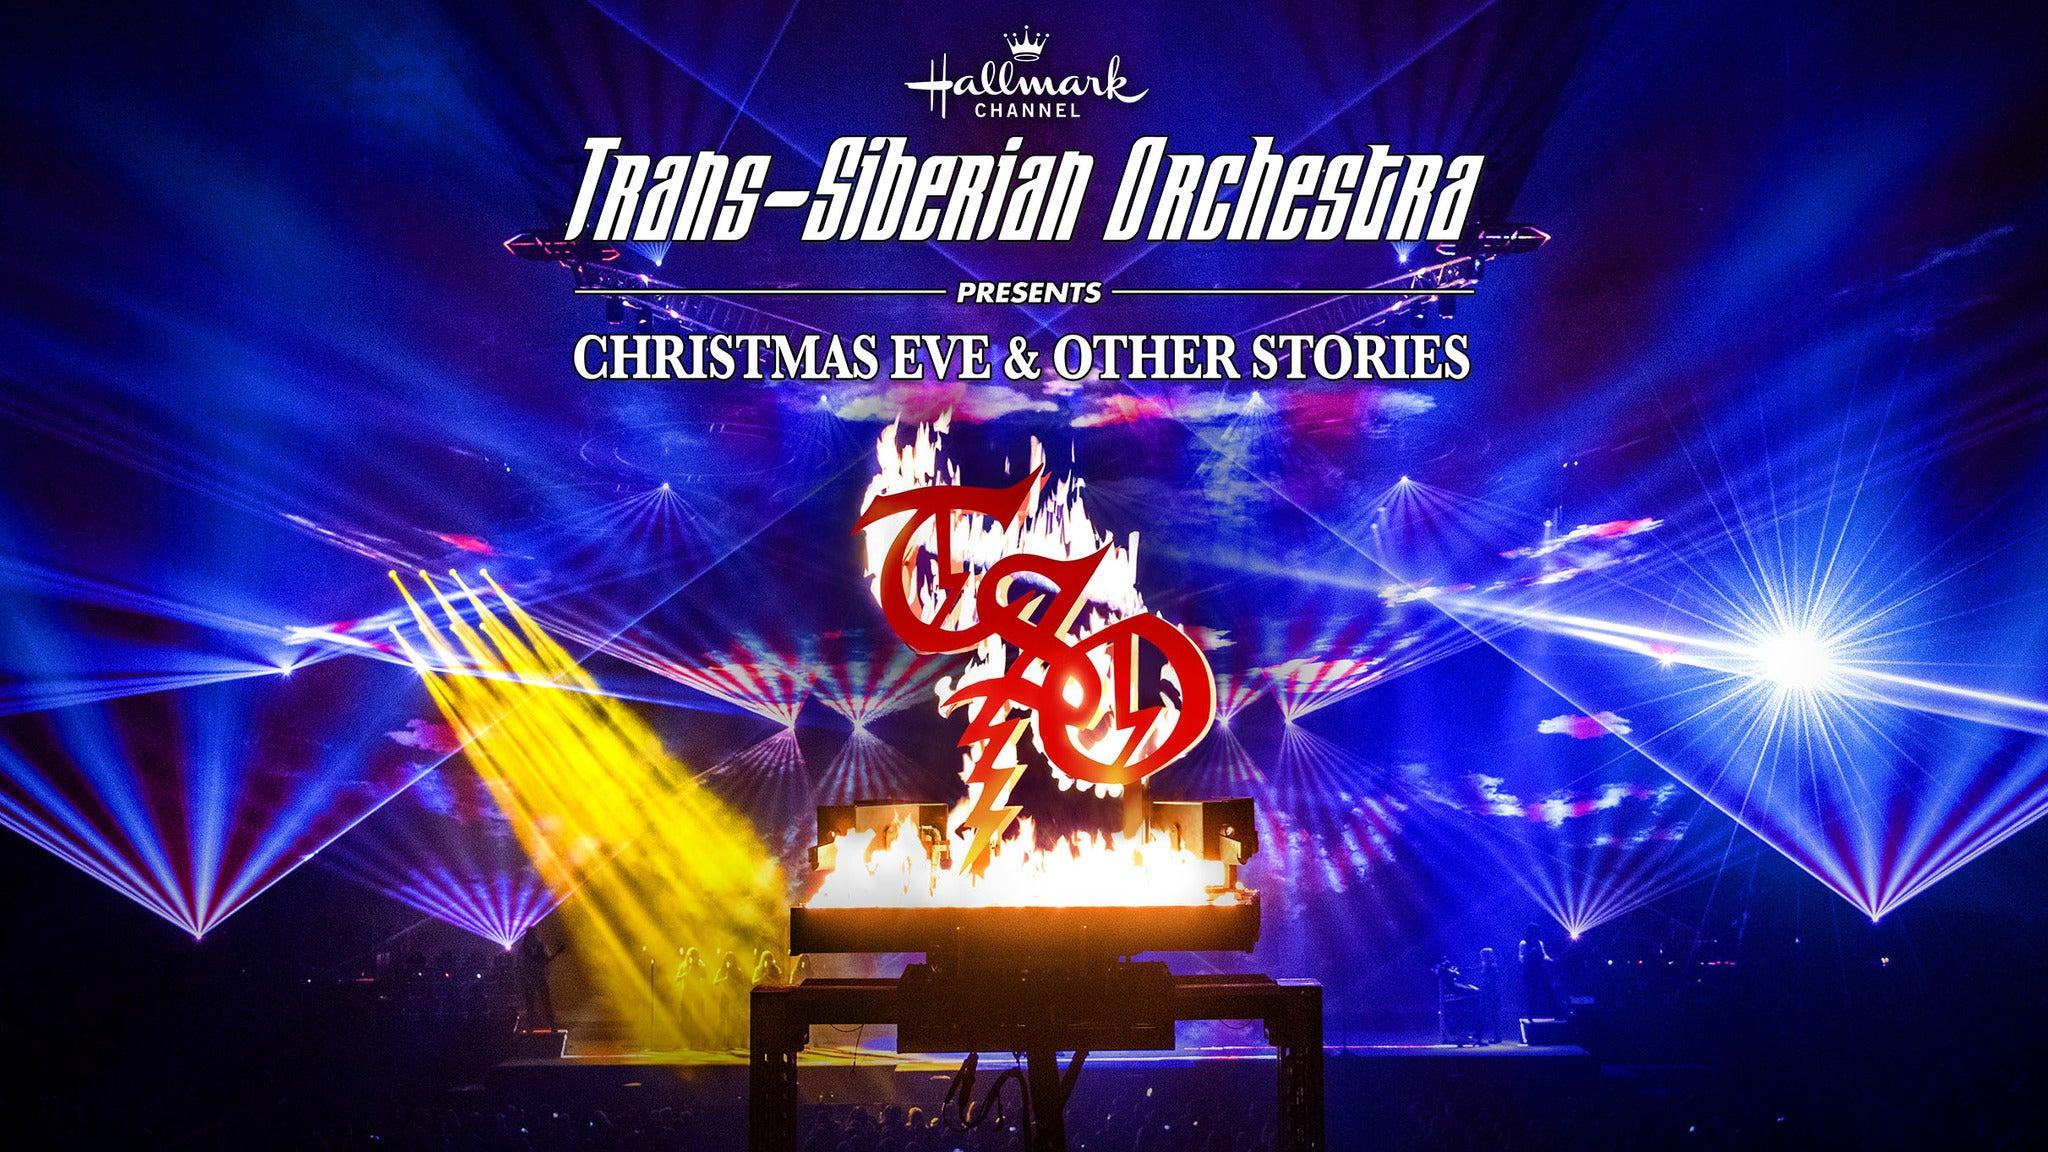 Trans-Siberian Orchestra 2019 Presented By Hallmar...